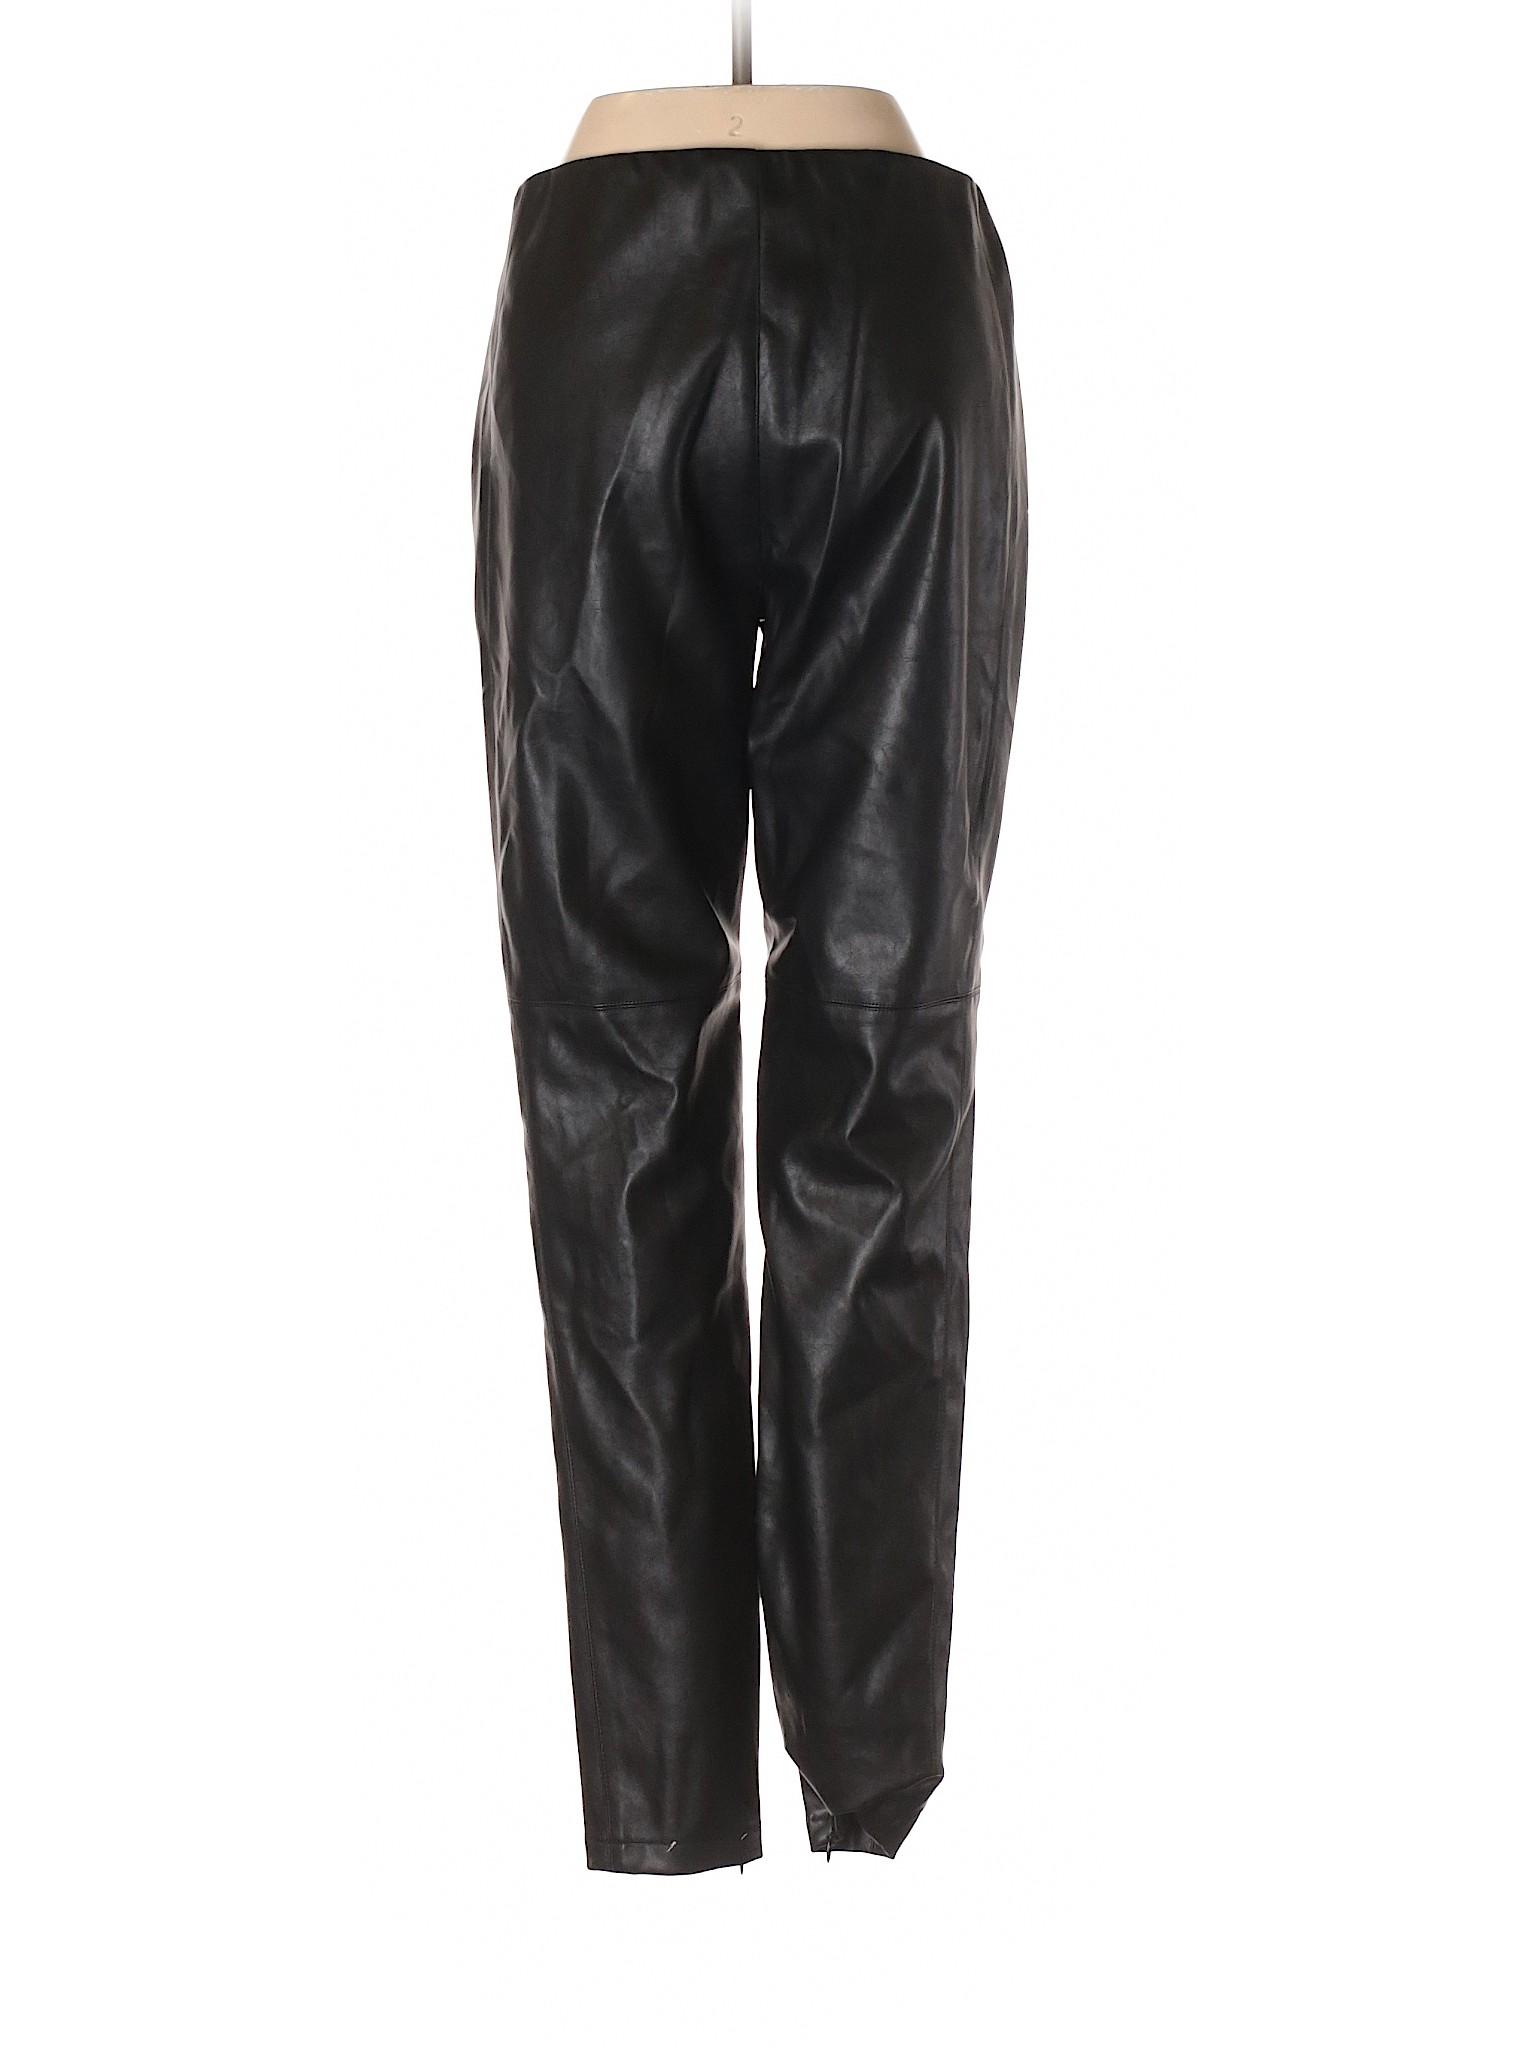 amp; winter Leisure Juliet Romeo Couture Leather Faux Pants qZgPEgT